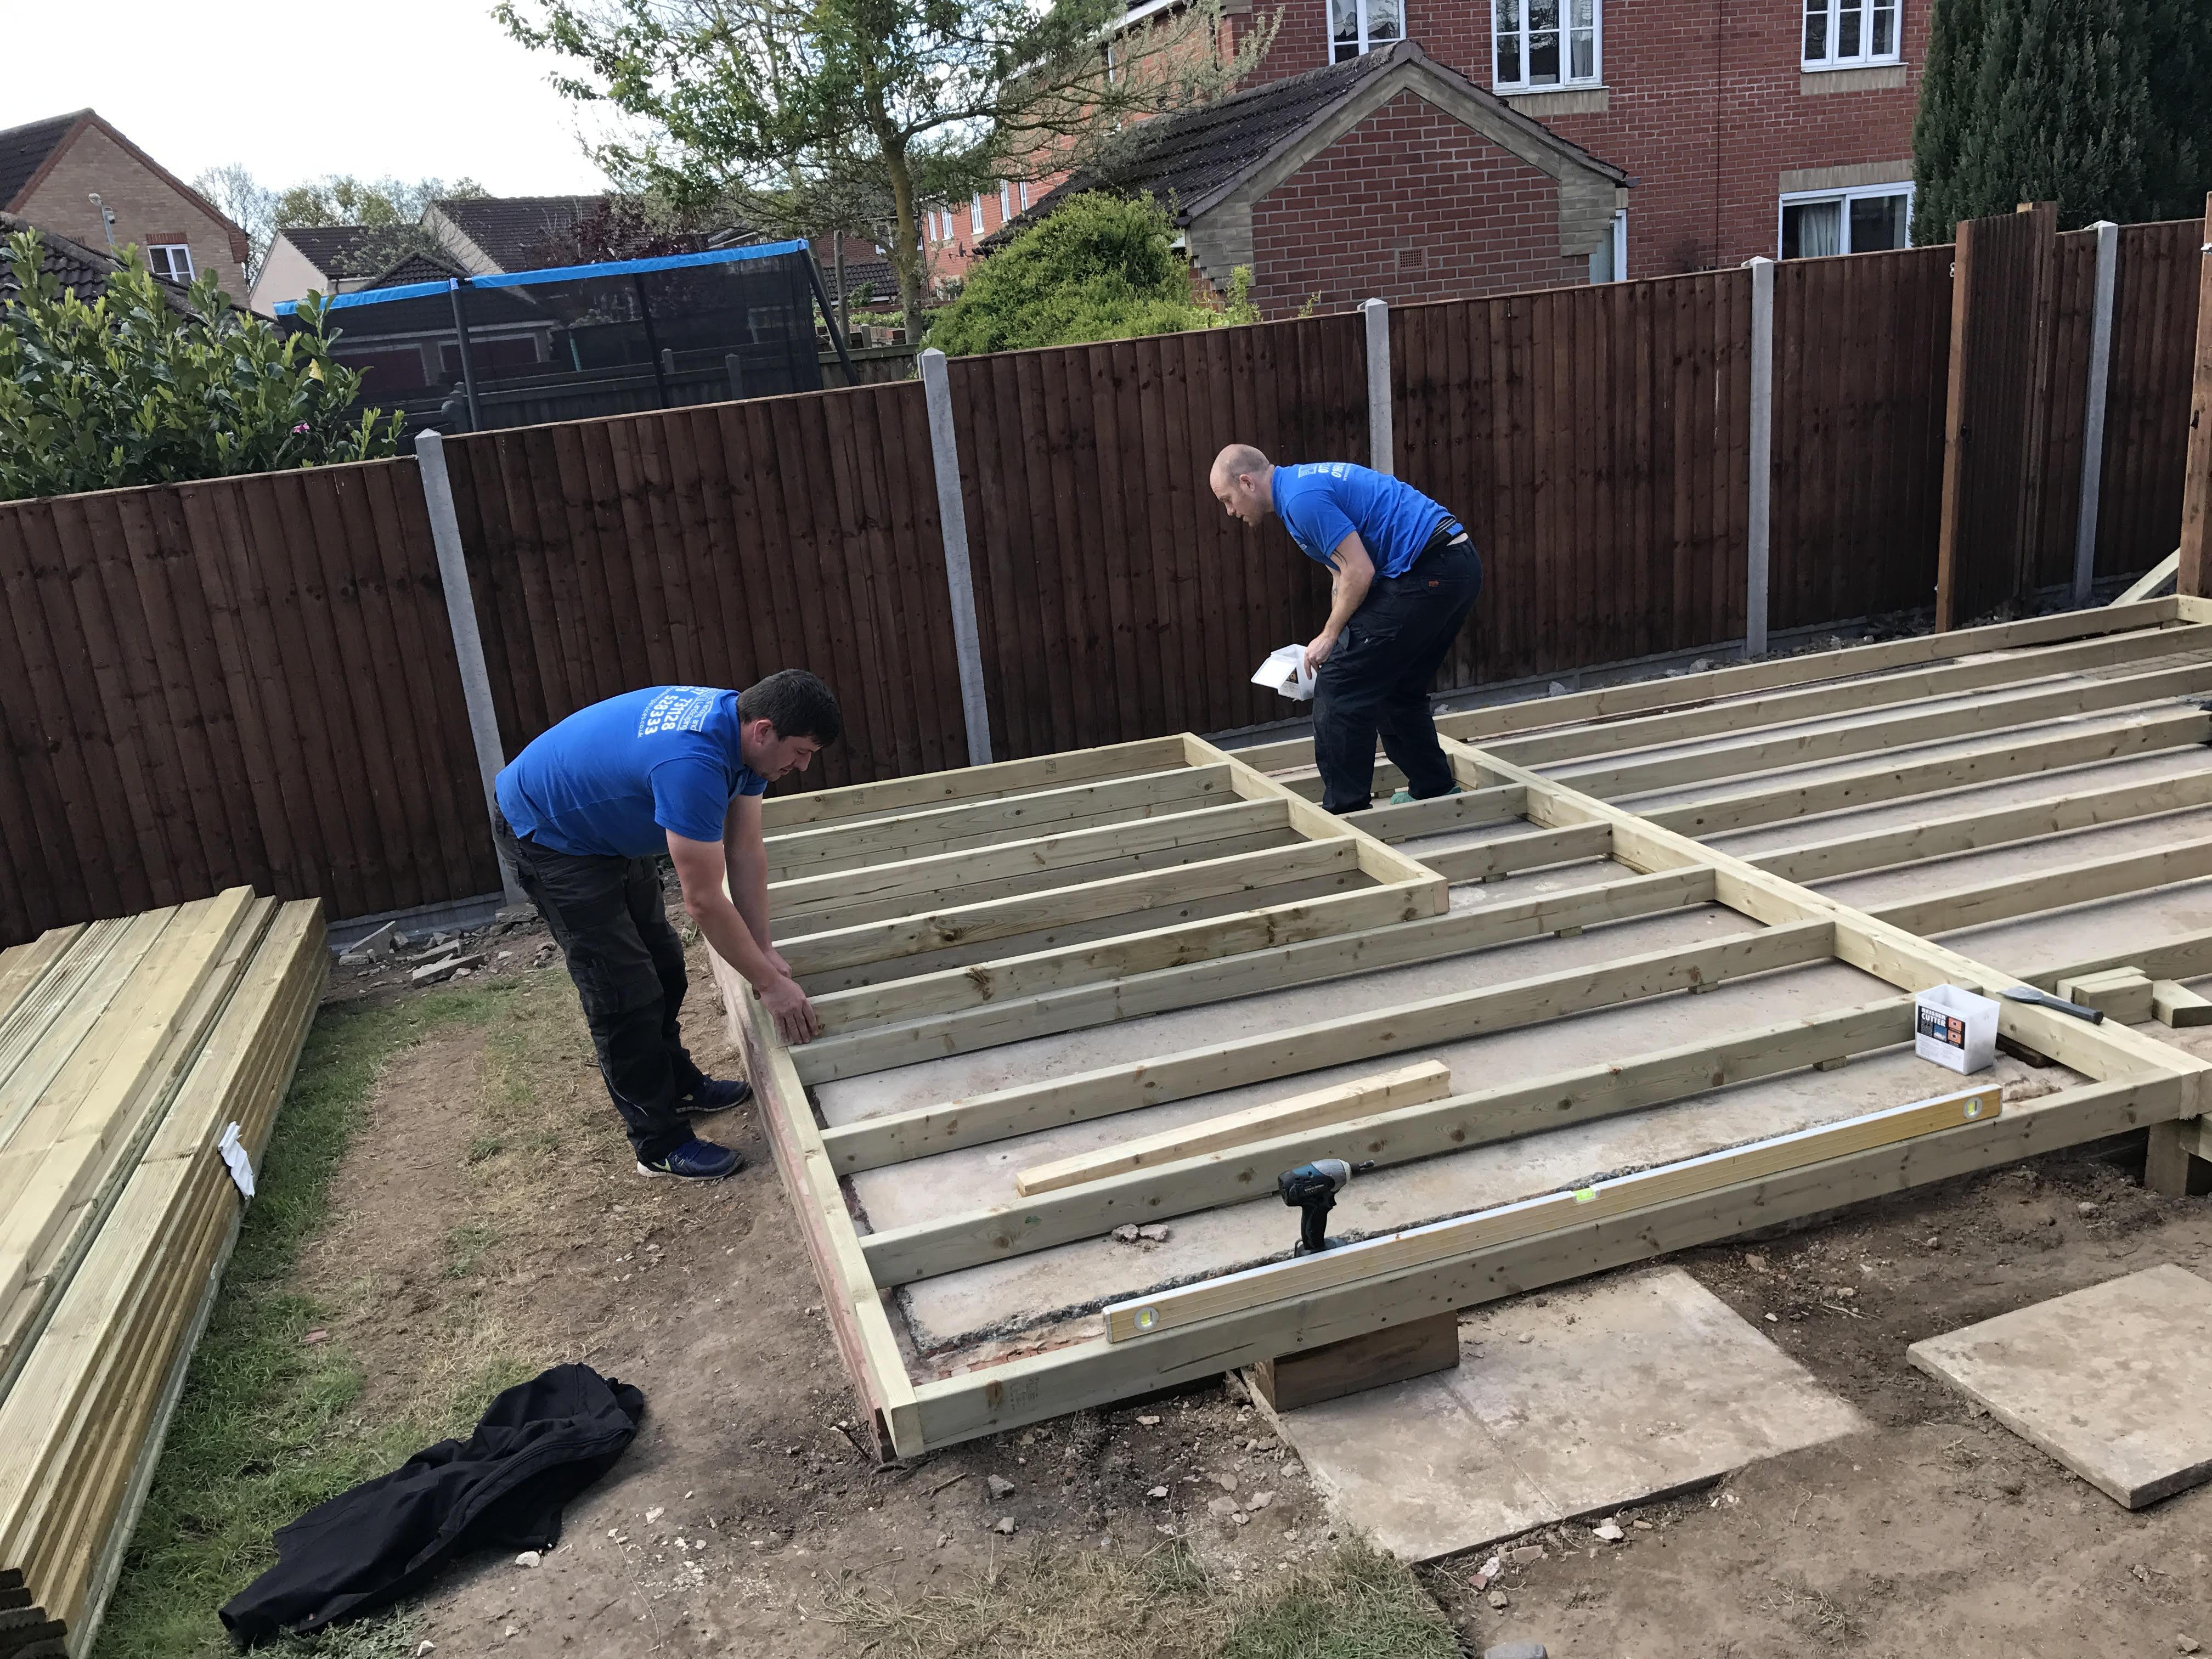 gardening services in Norwich